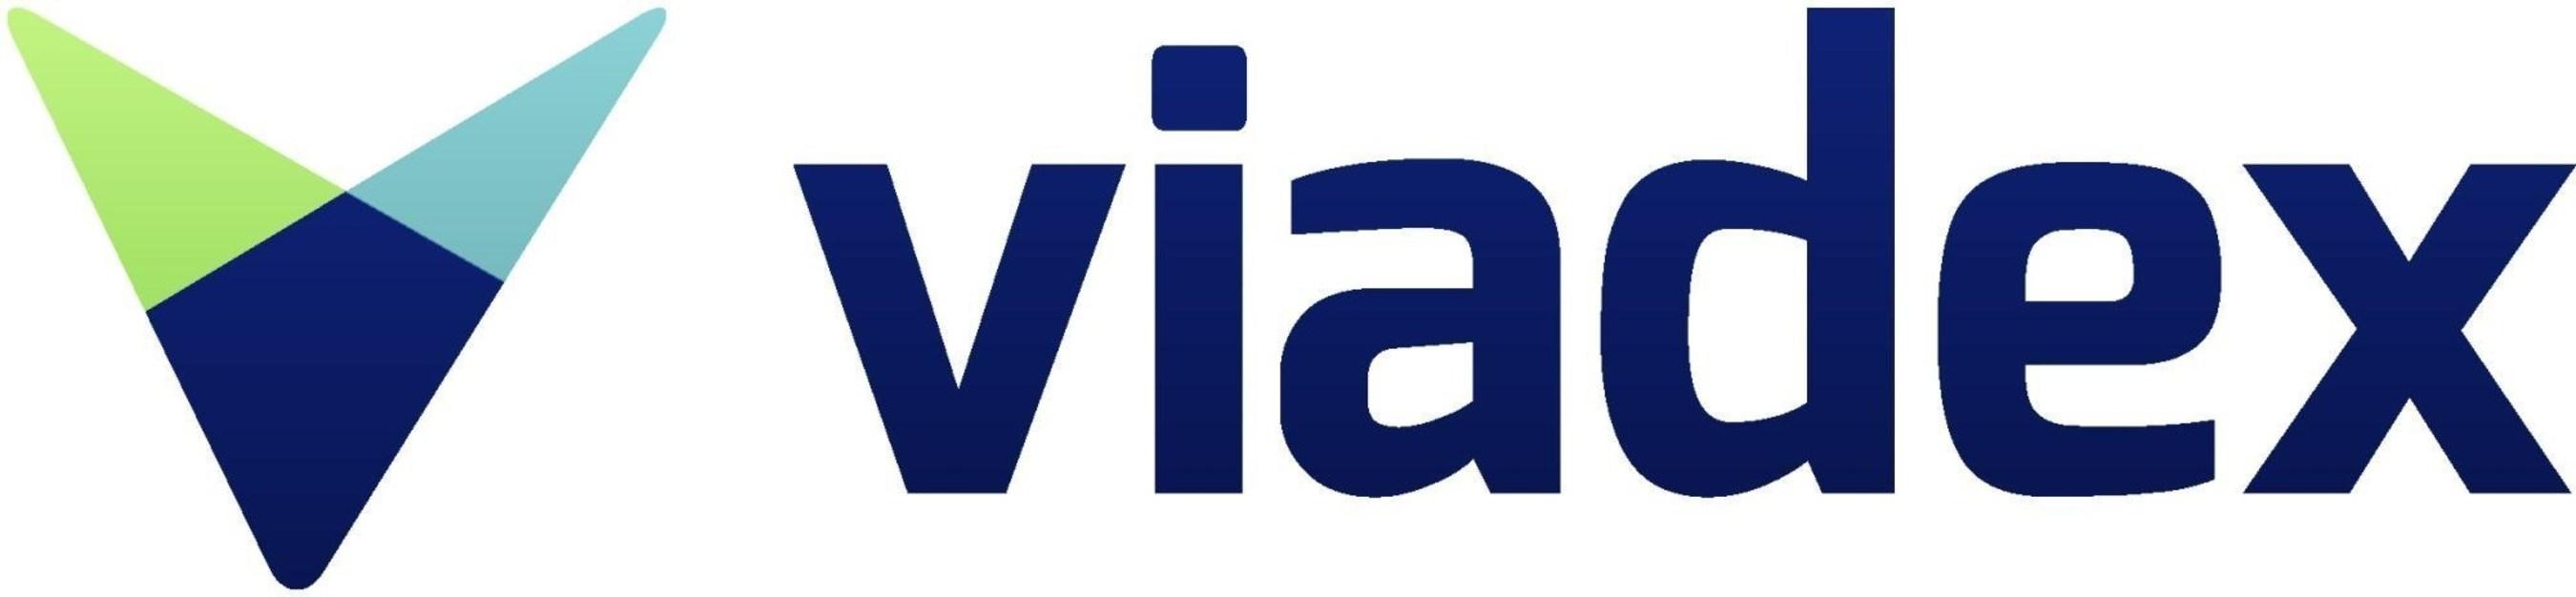 Viadex Logo (PRNewsFoto/Viadex Limited) (PRNewsFoto/Viadex Limited)